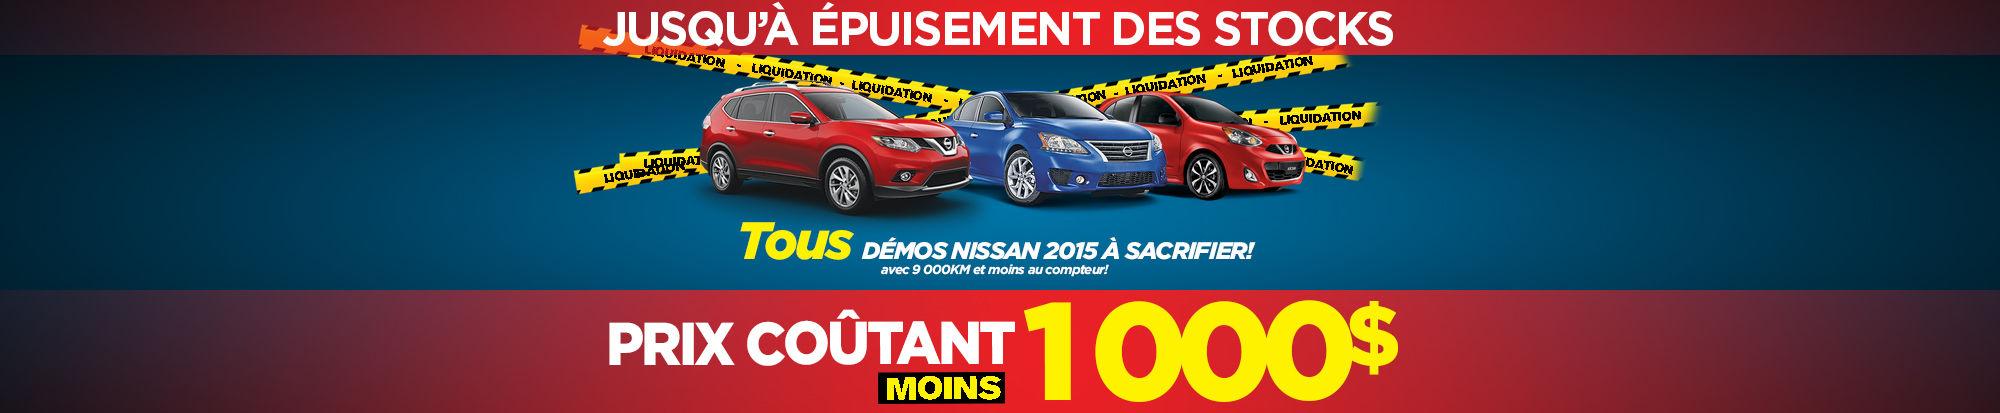 Liquidation démos Nissan 2015